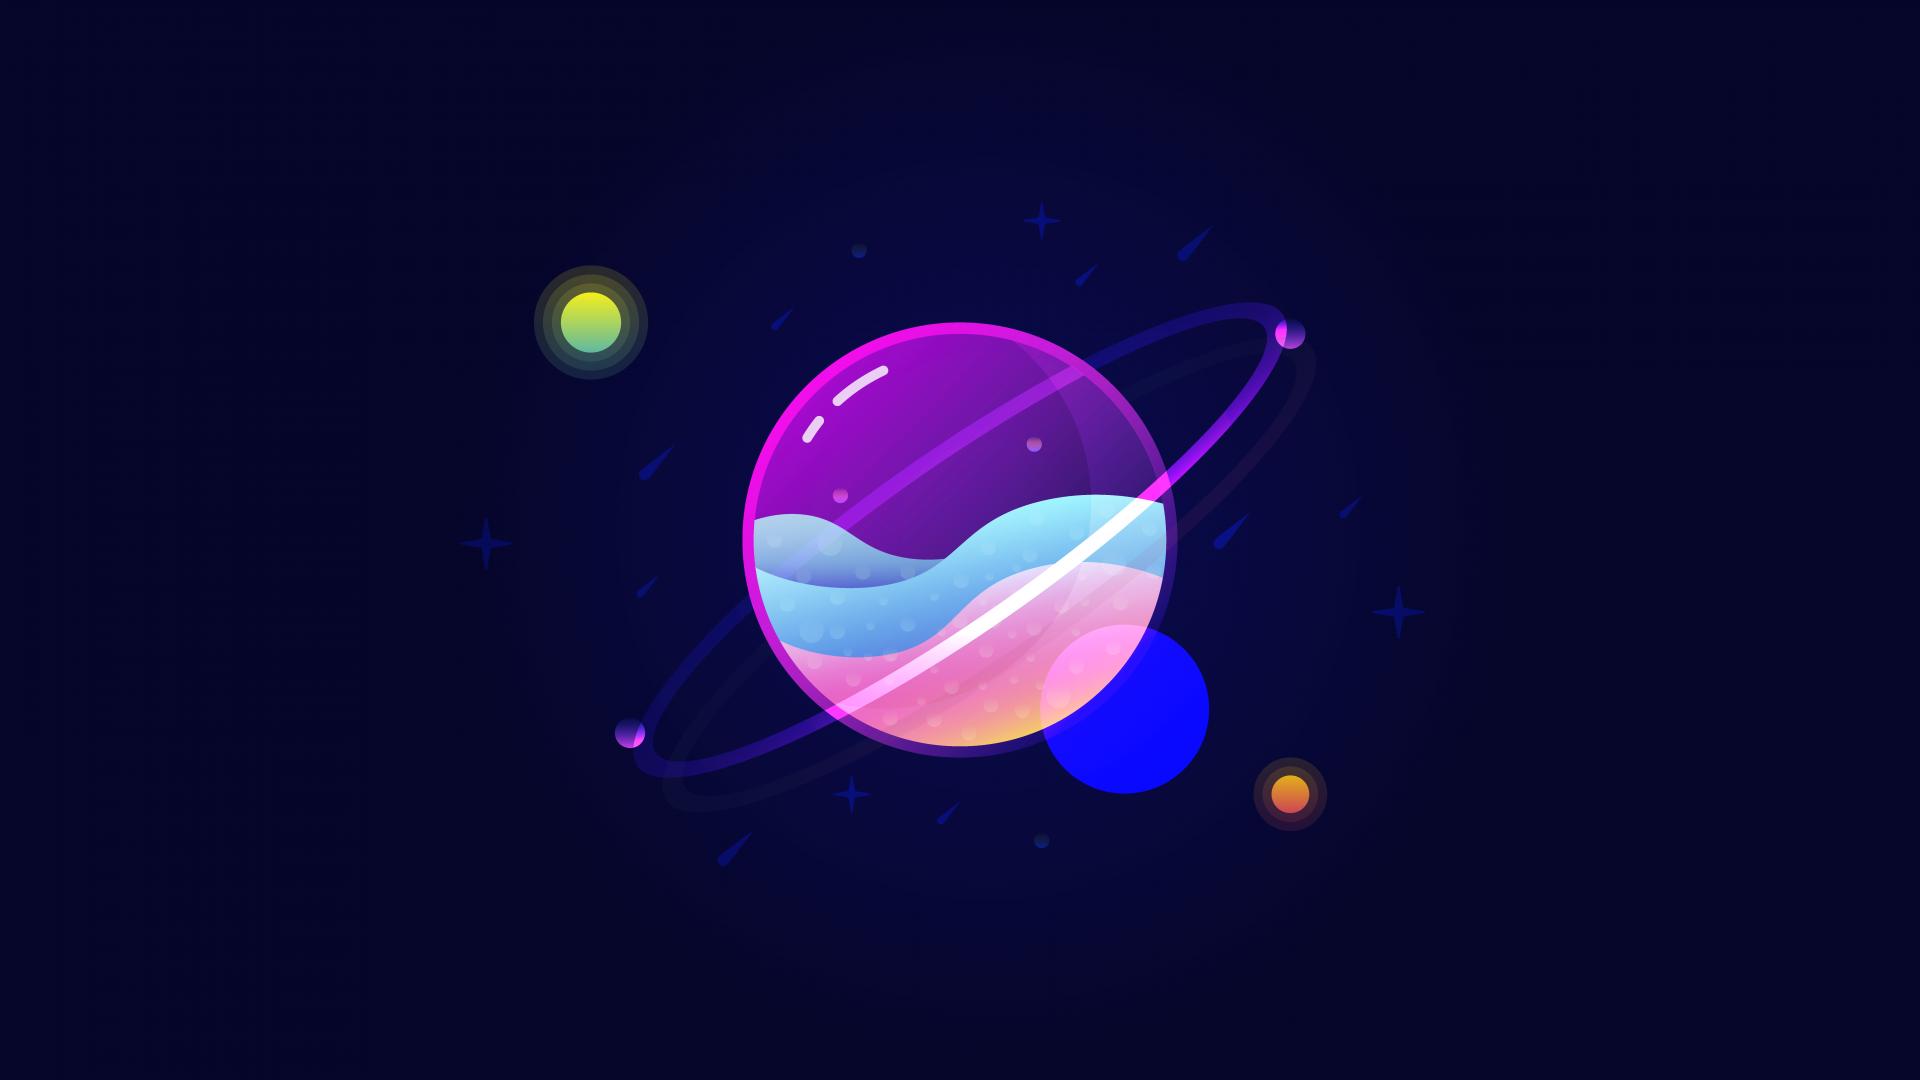 Solar System Planets Orbit Minimal Neon Saturn Amoled 4k 8k 10k 1440x2560 Wallpaper Disenos De Unas Walle